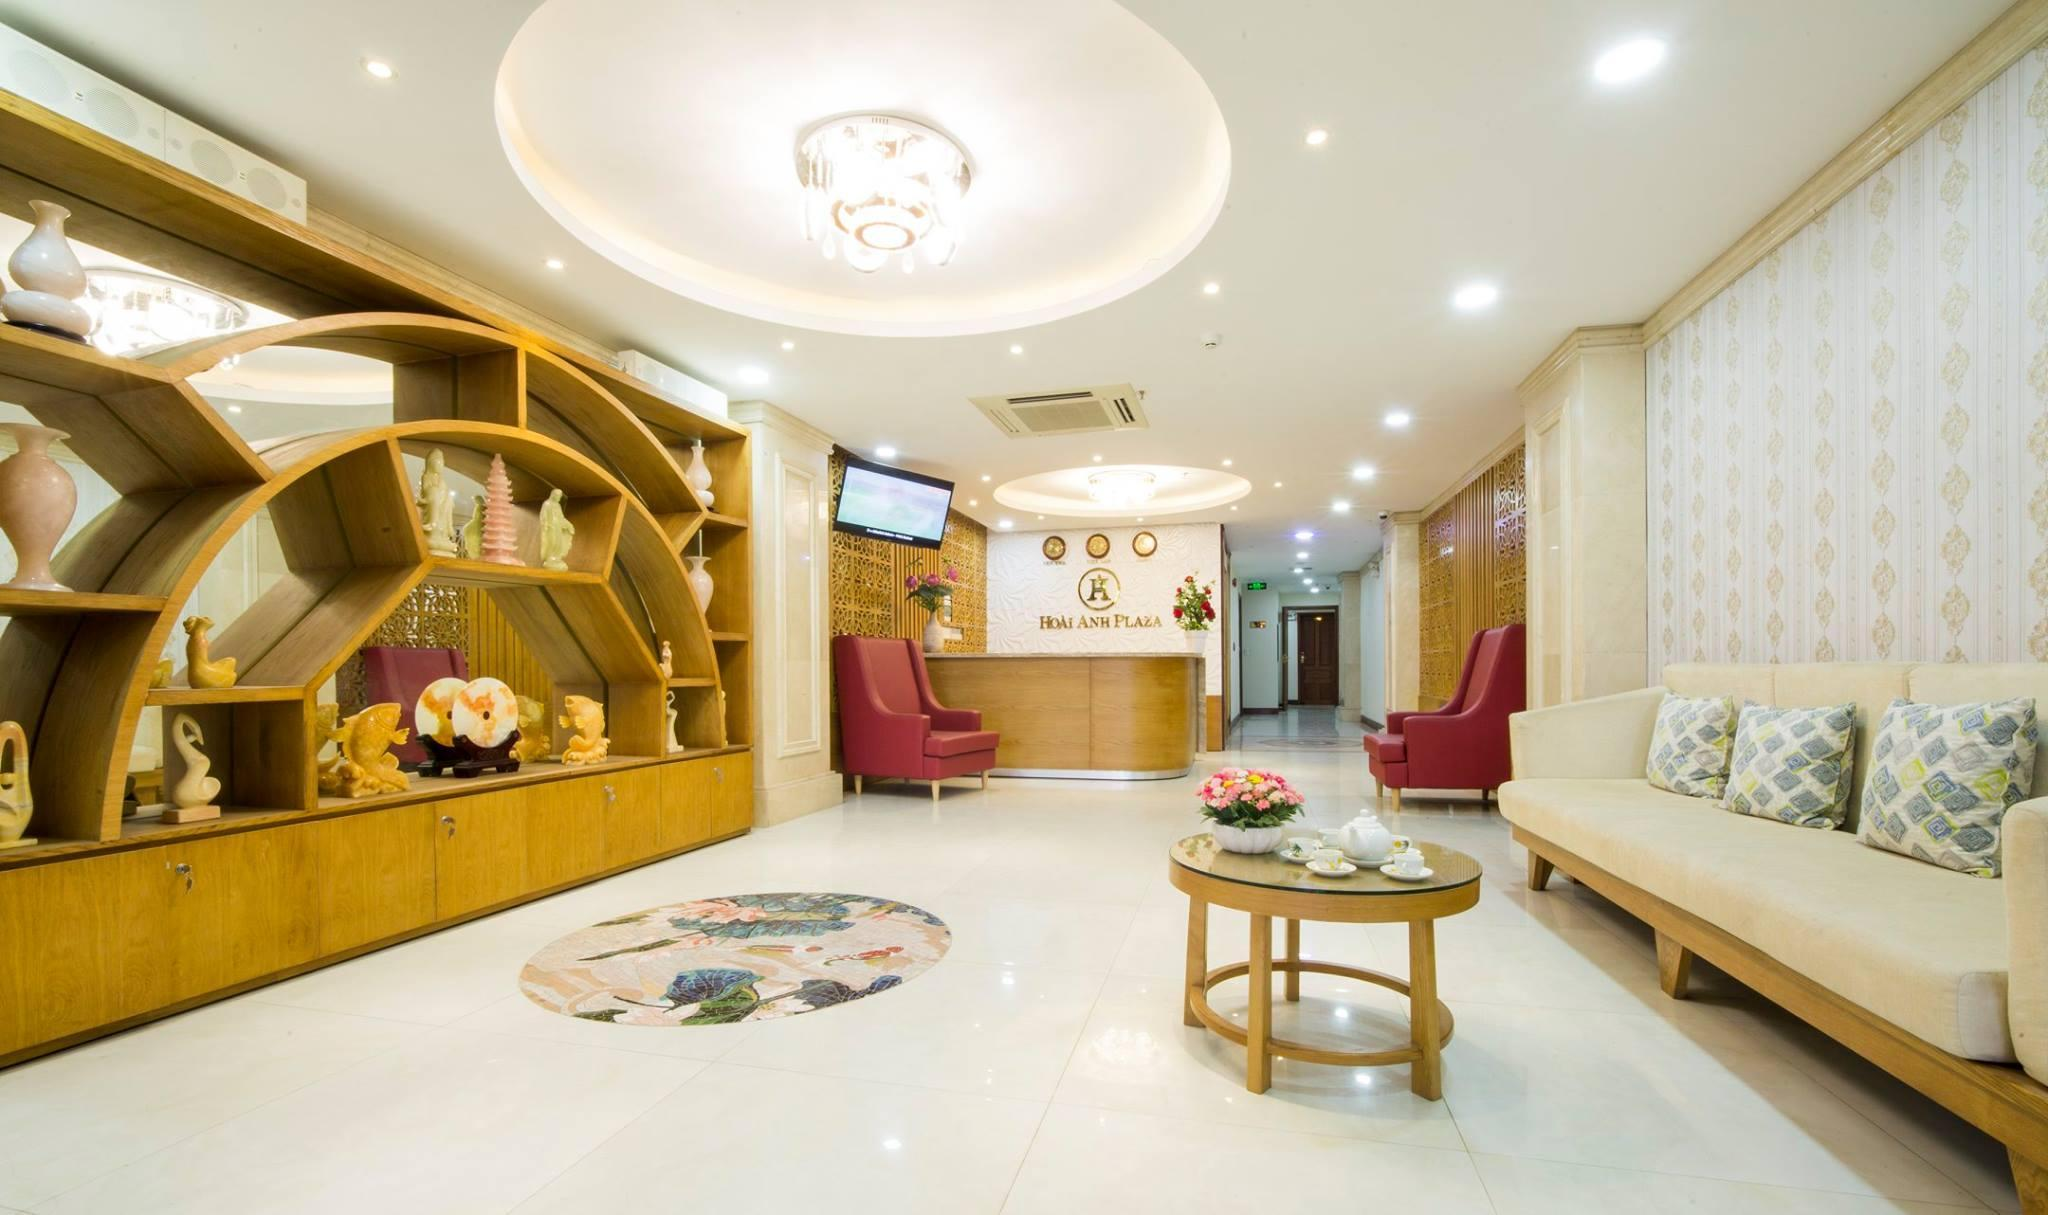 Hoai Anh Plaza Hotel